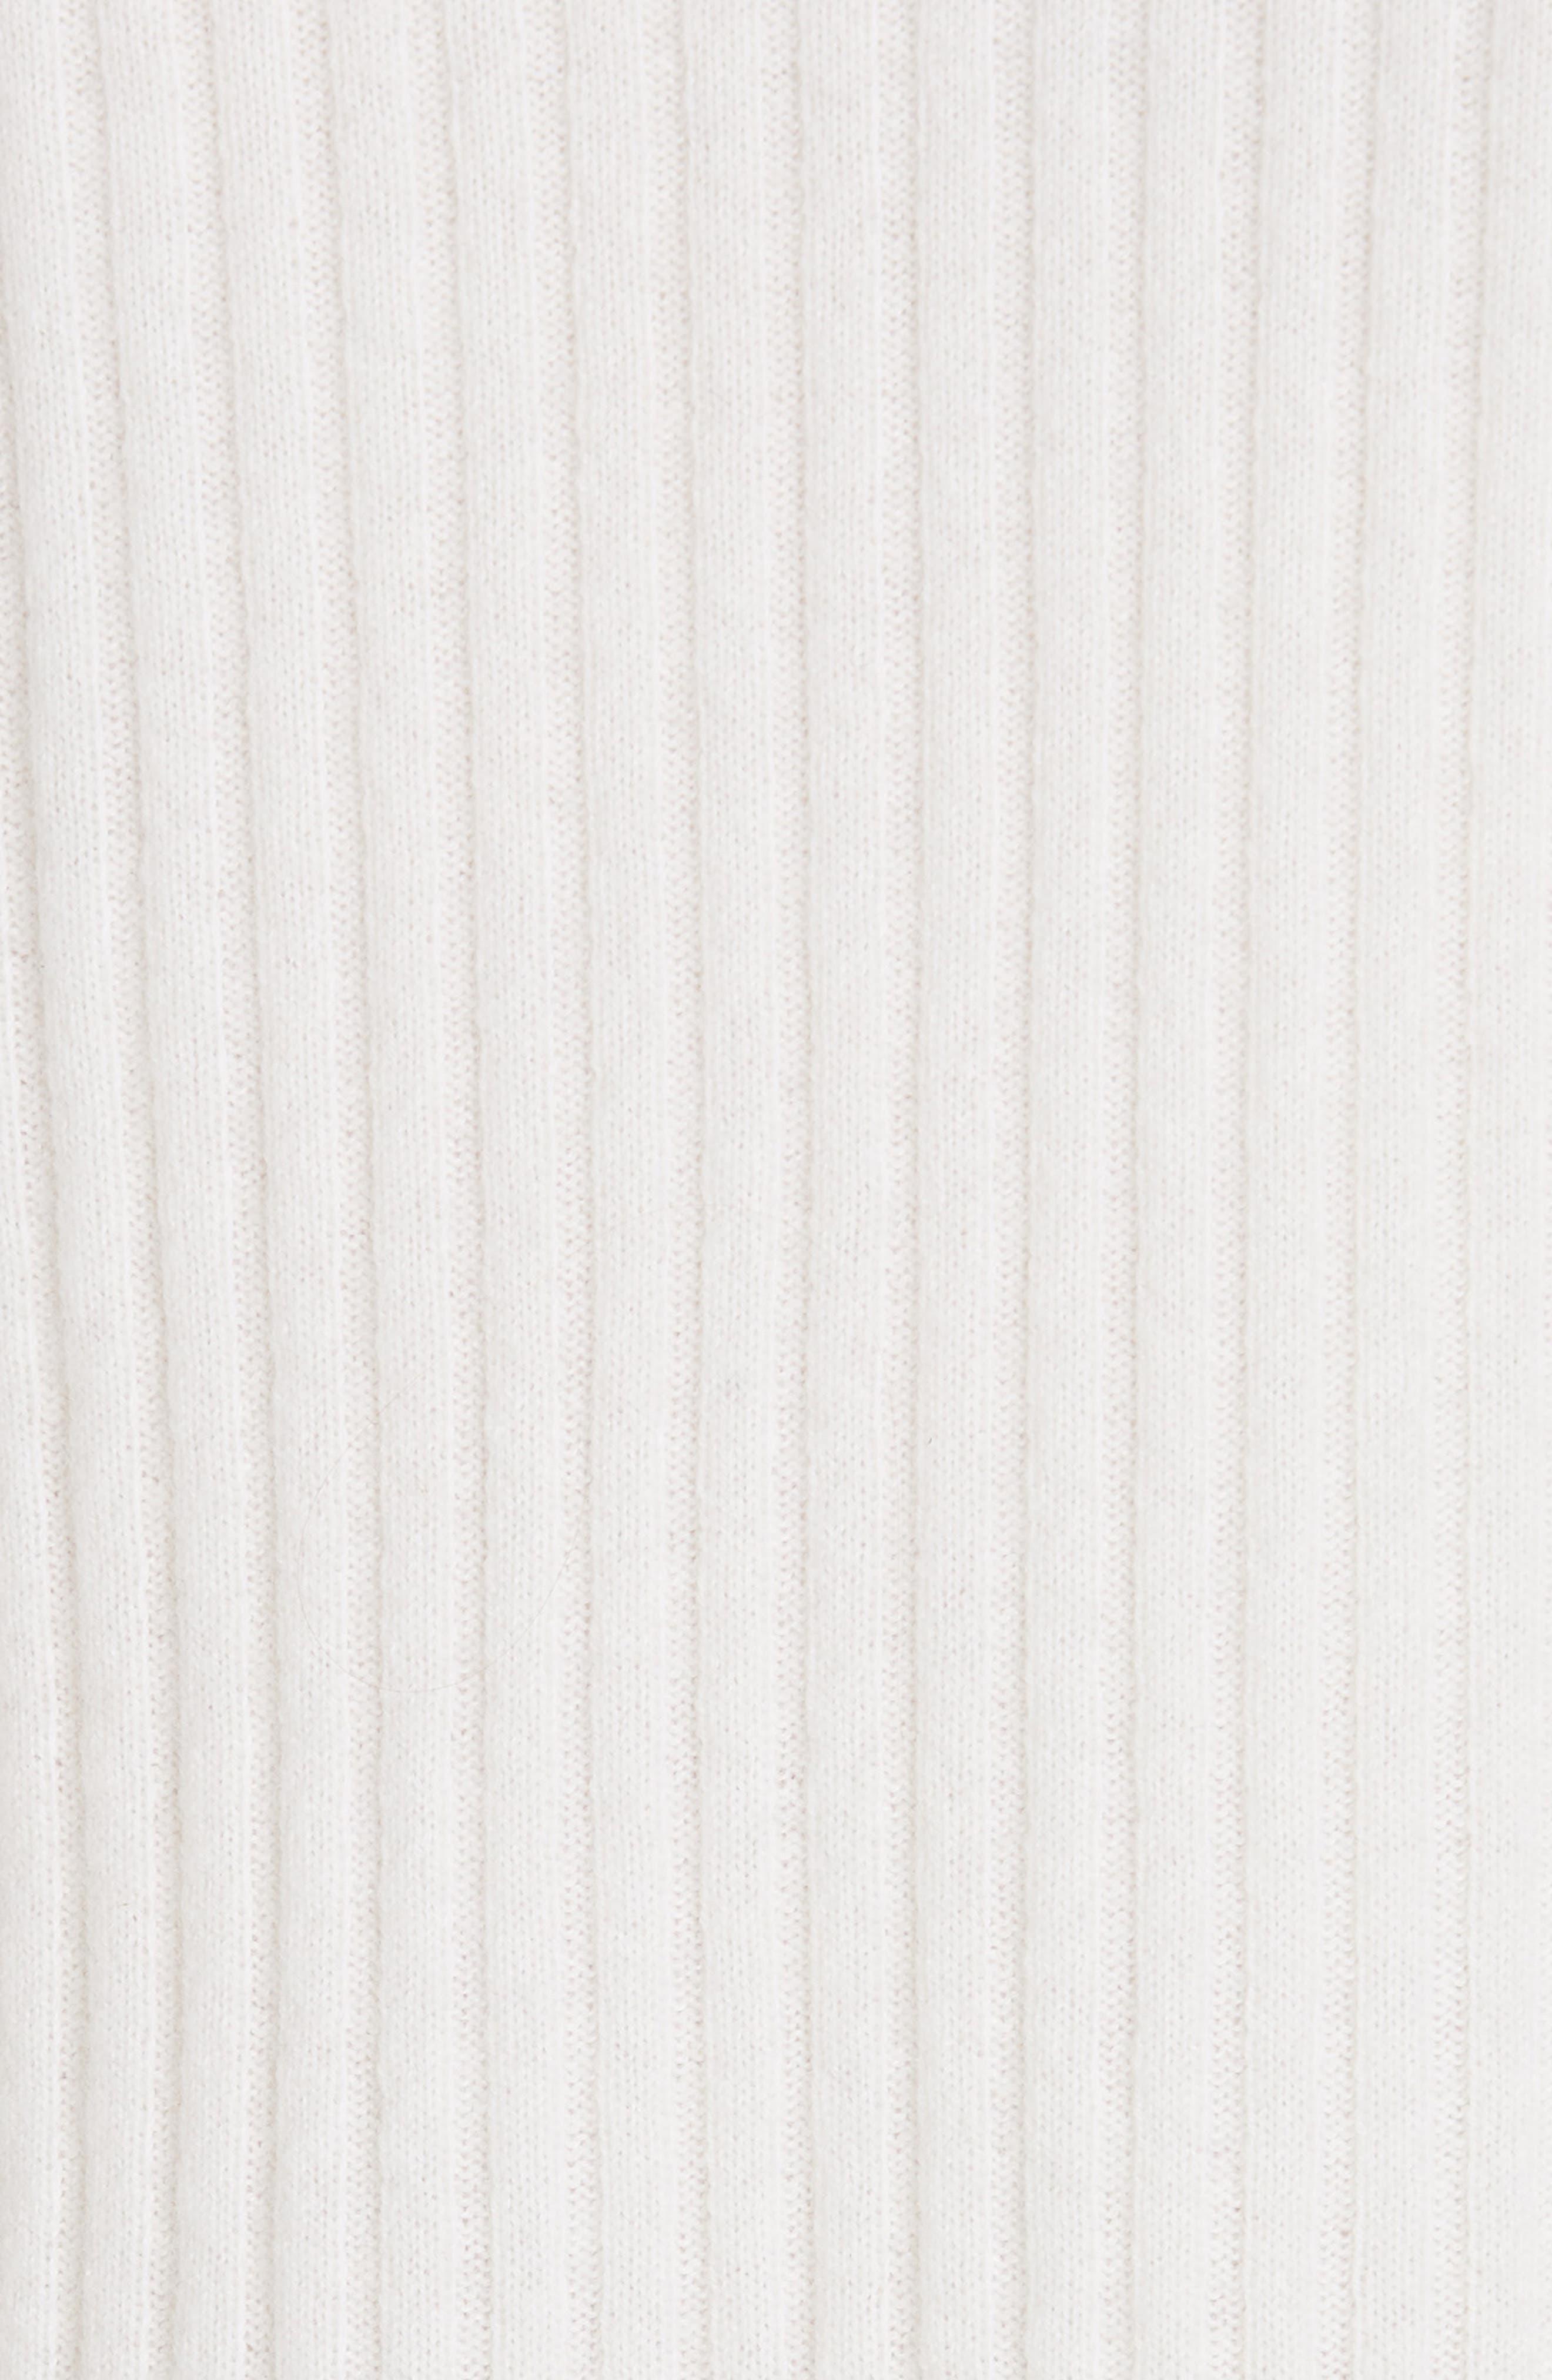 Shoulder Slit Cashmere Crewneck Sweater,                             Alternate thumbnail 5, color,                             Off White